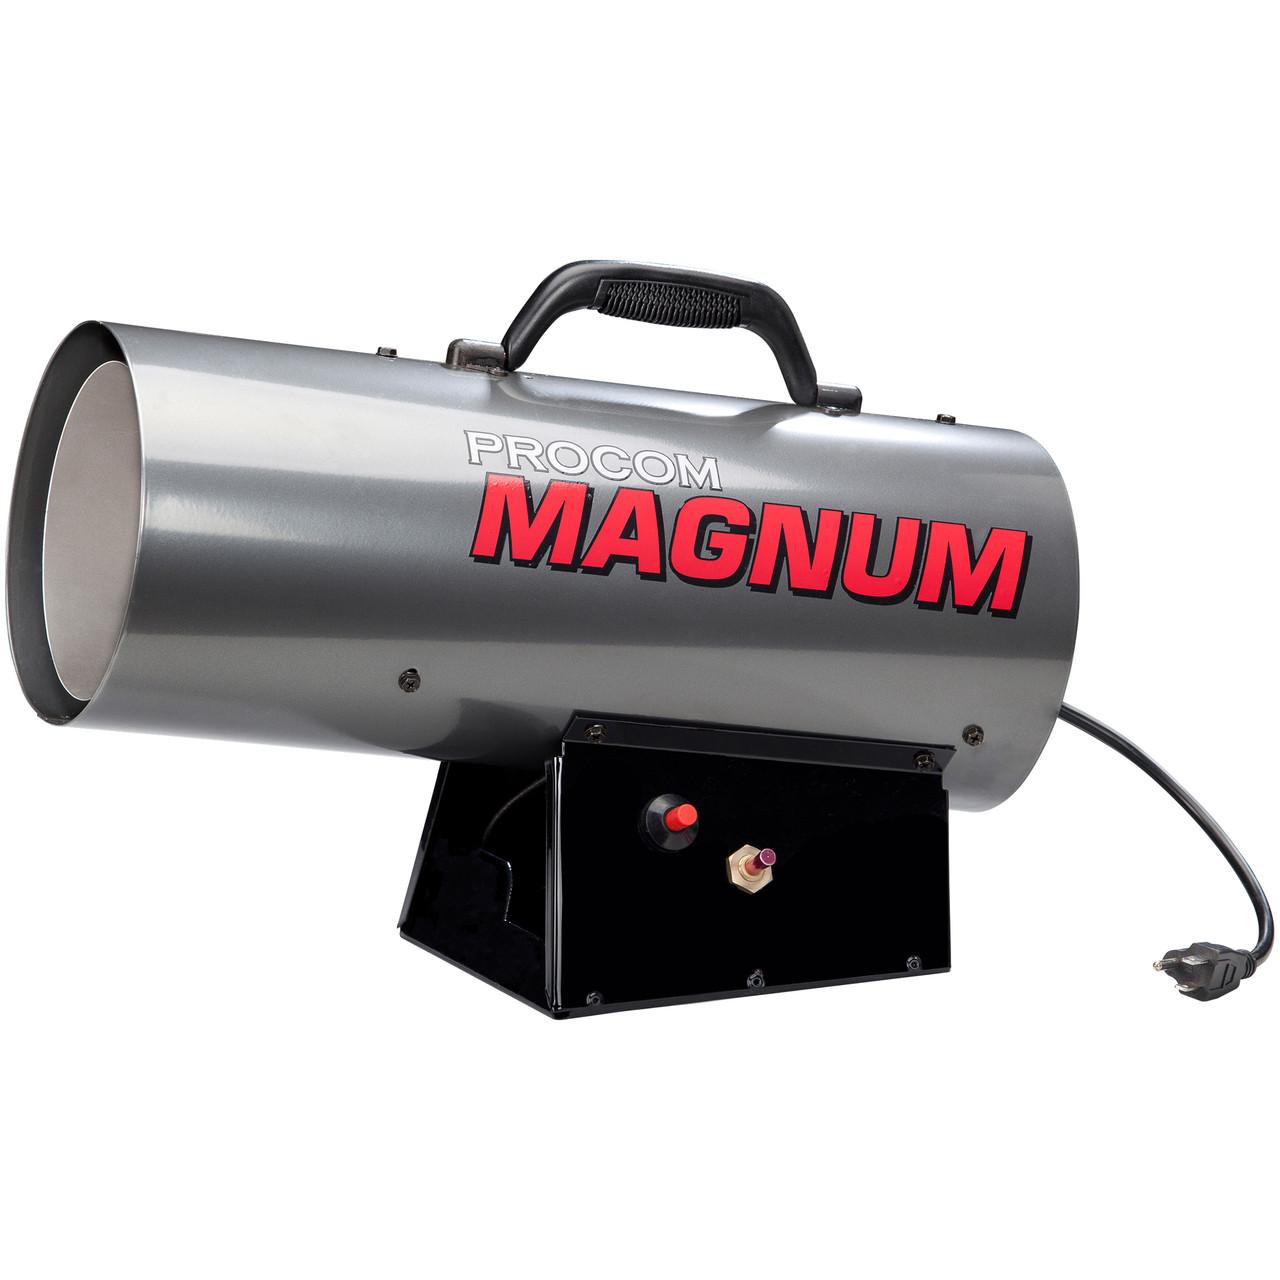 Procom Magnum Forced Air Propane Heater 40 000 Btu Model Pcfa40 Factory Buys Direct